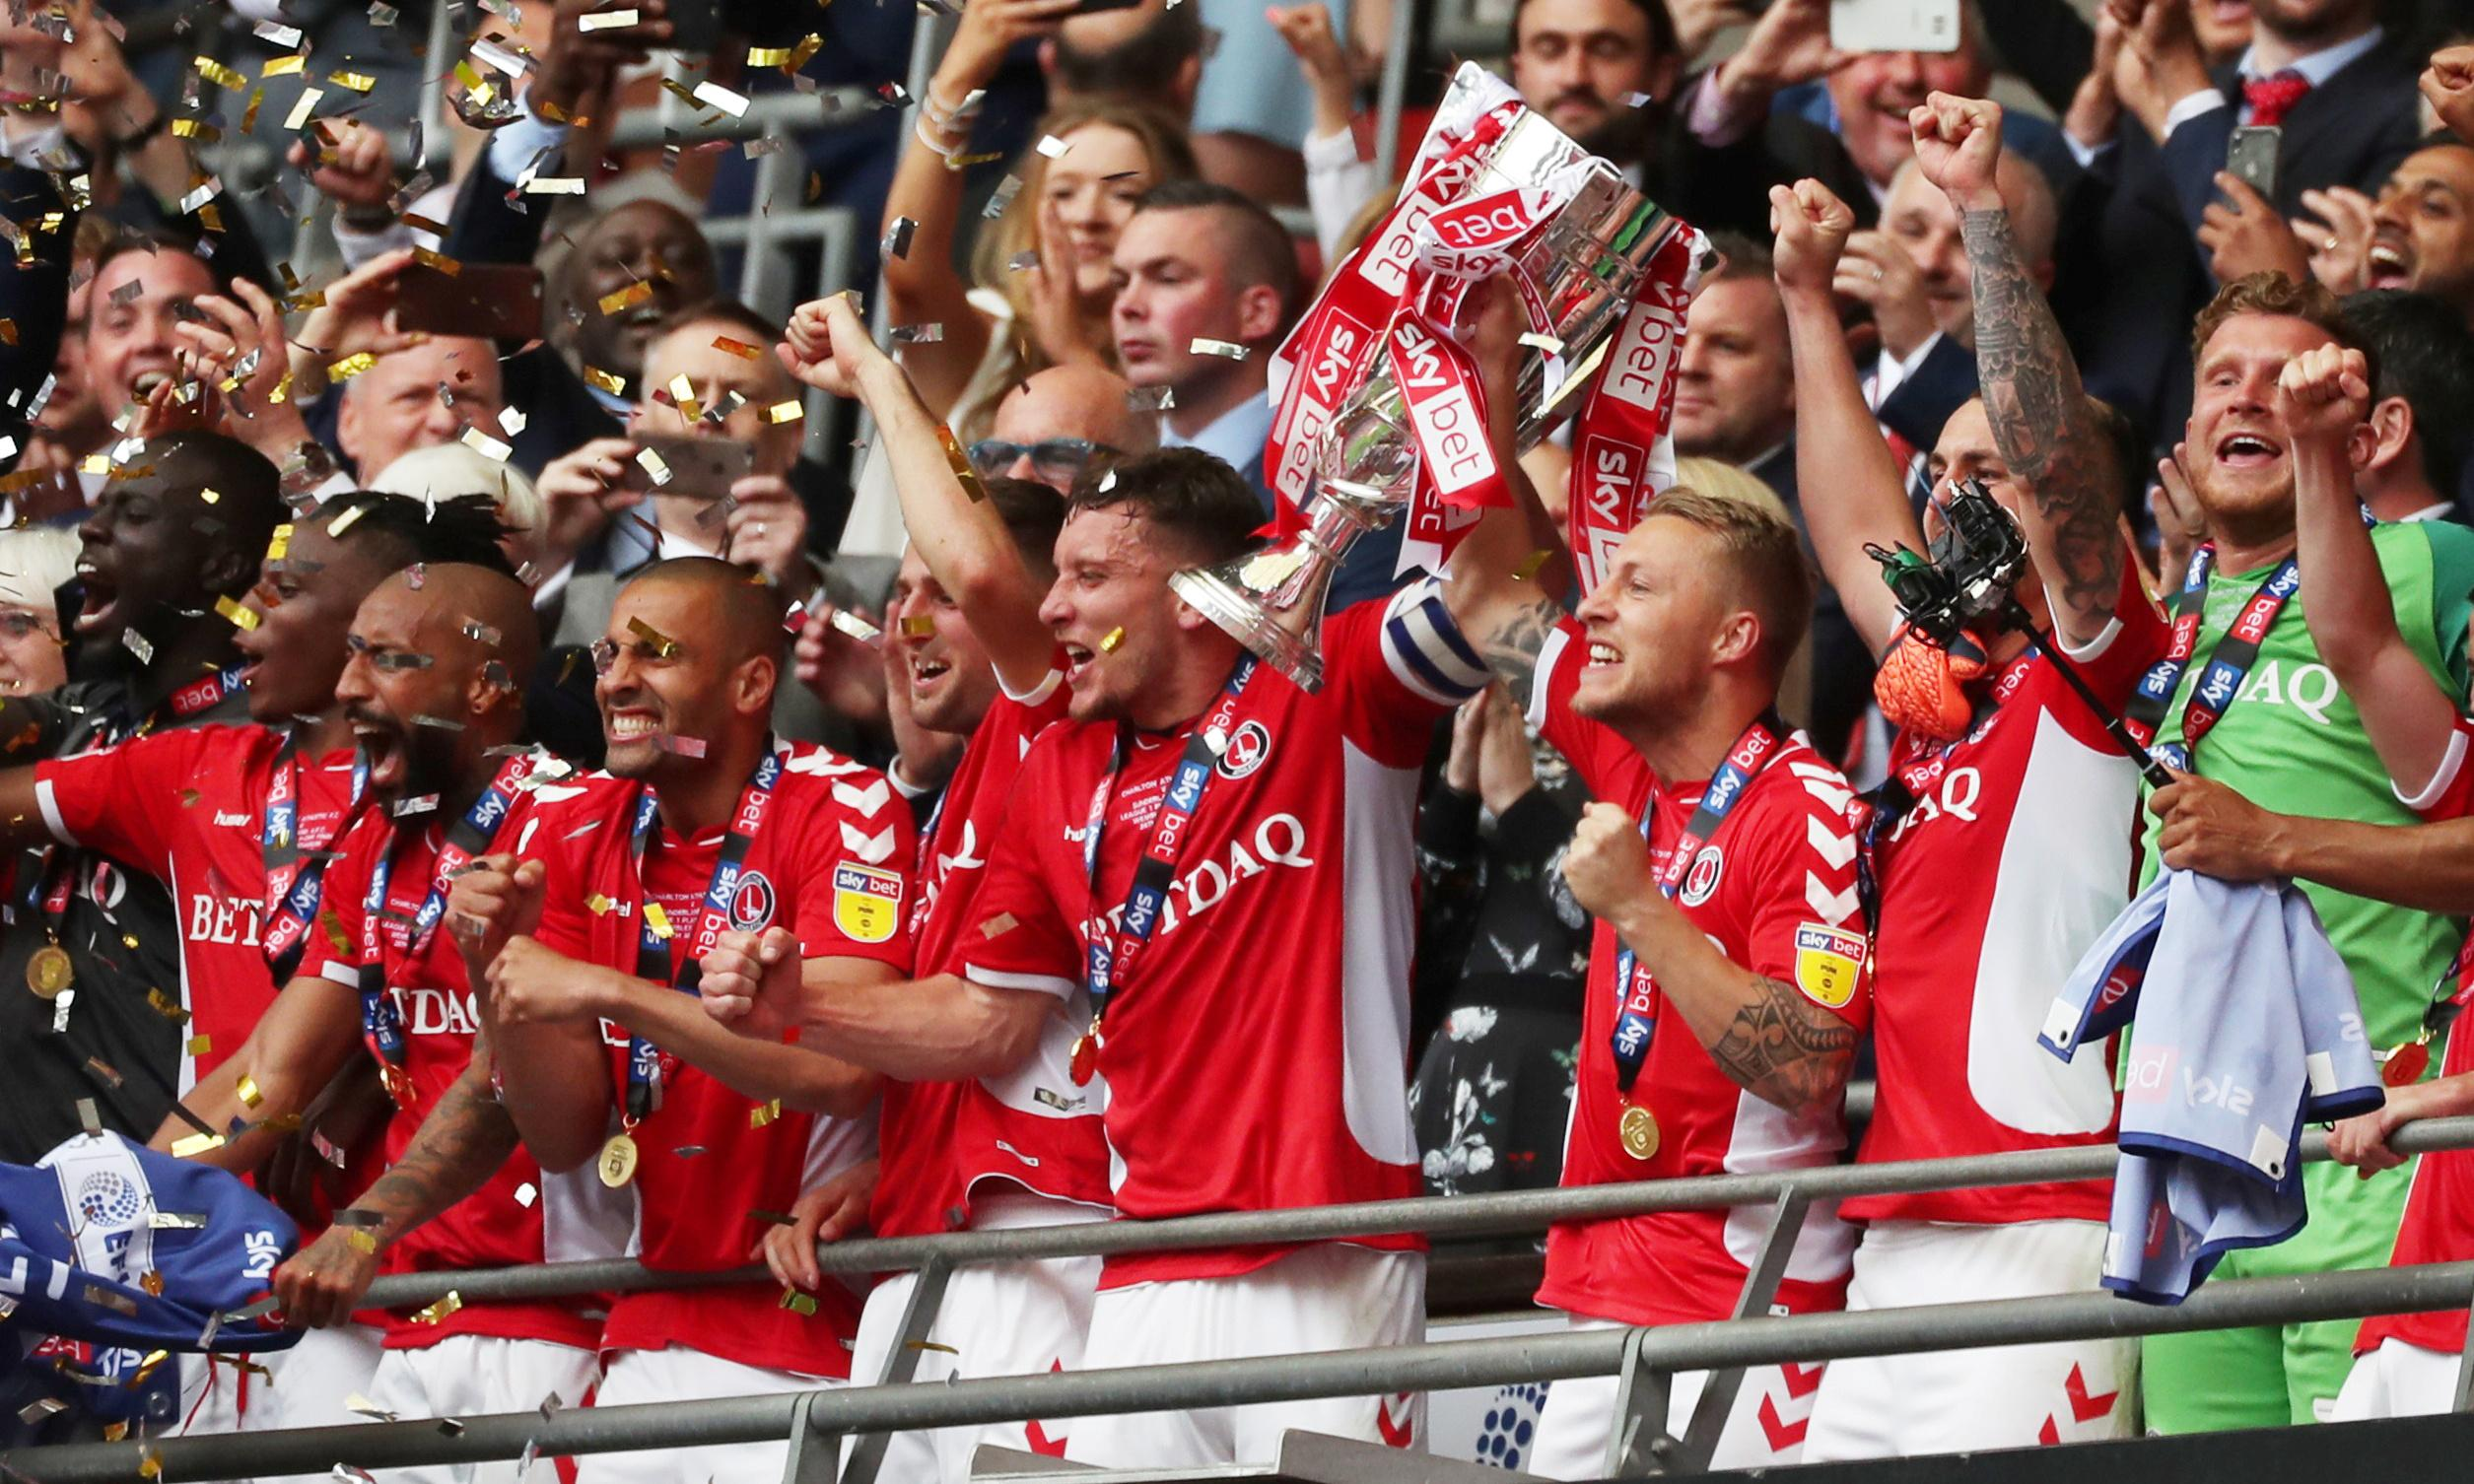 Charlton return to Championship after Patrick Bauer scores last-gasp winner